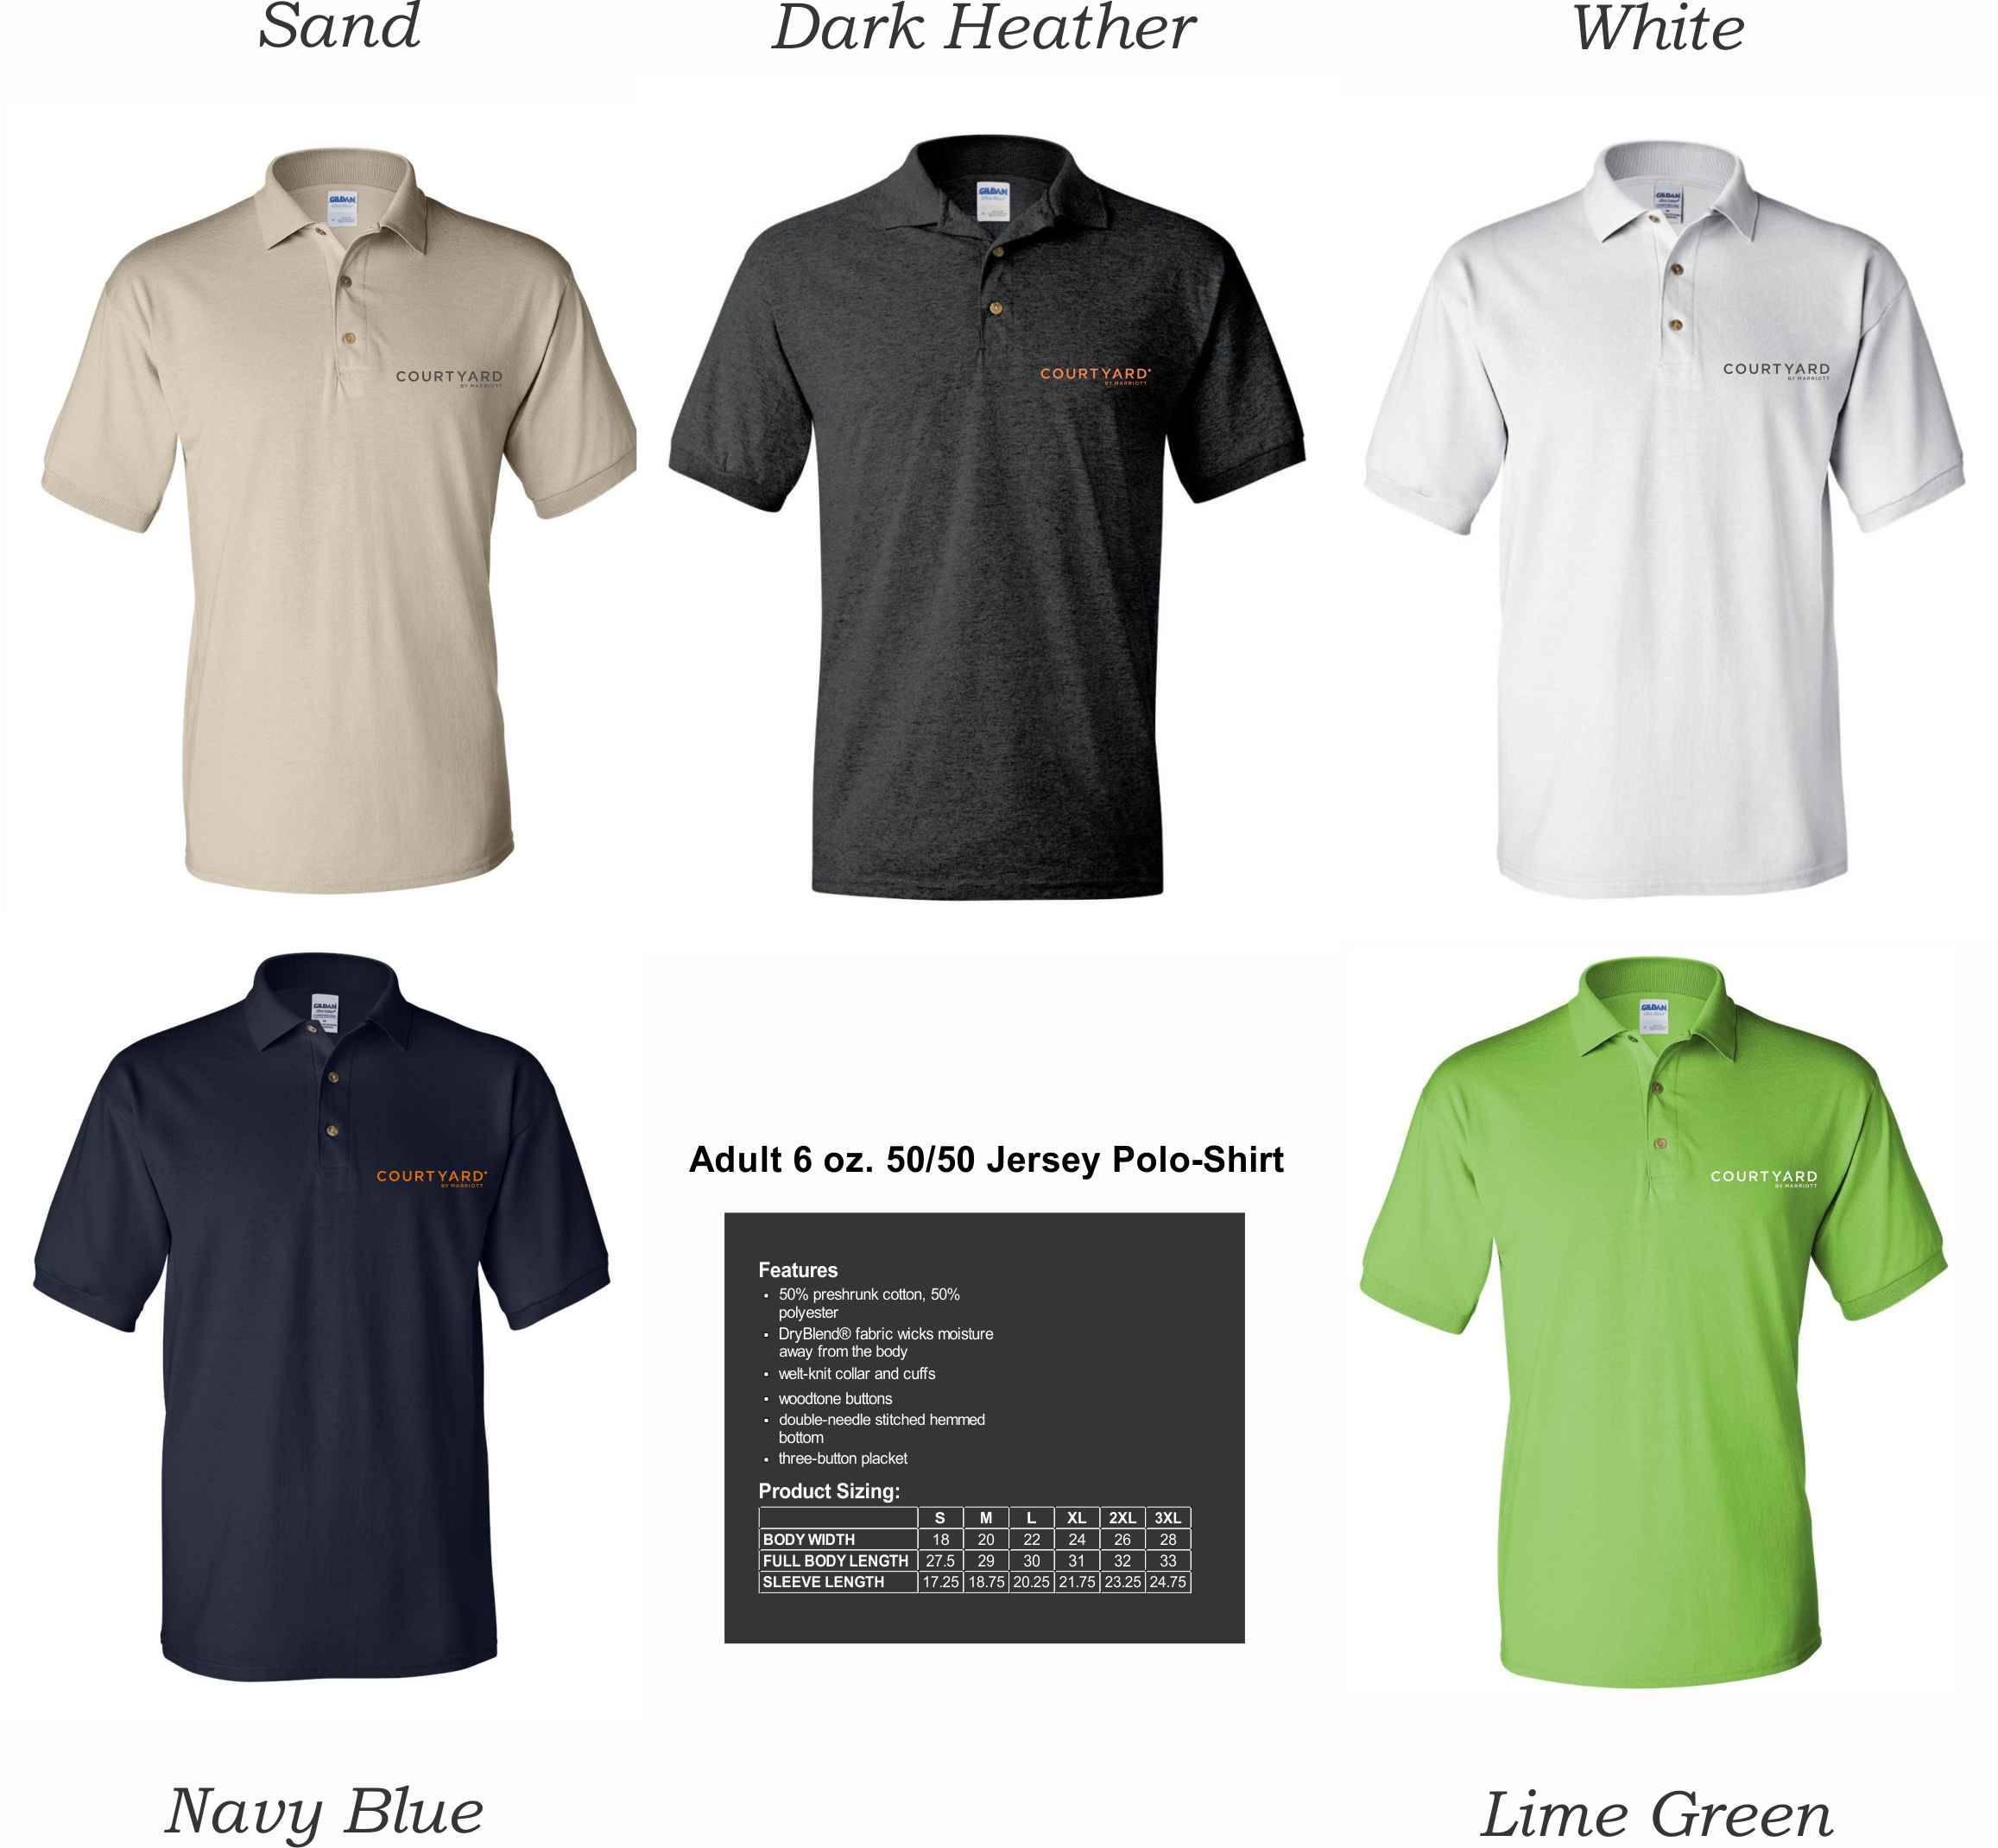 Polo Shirts, DryBlend 50/50 Fabric   Silk-Screen Logo - 3-Button Placket - Knitted Collar/Cuffs